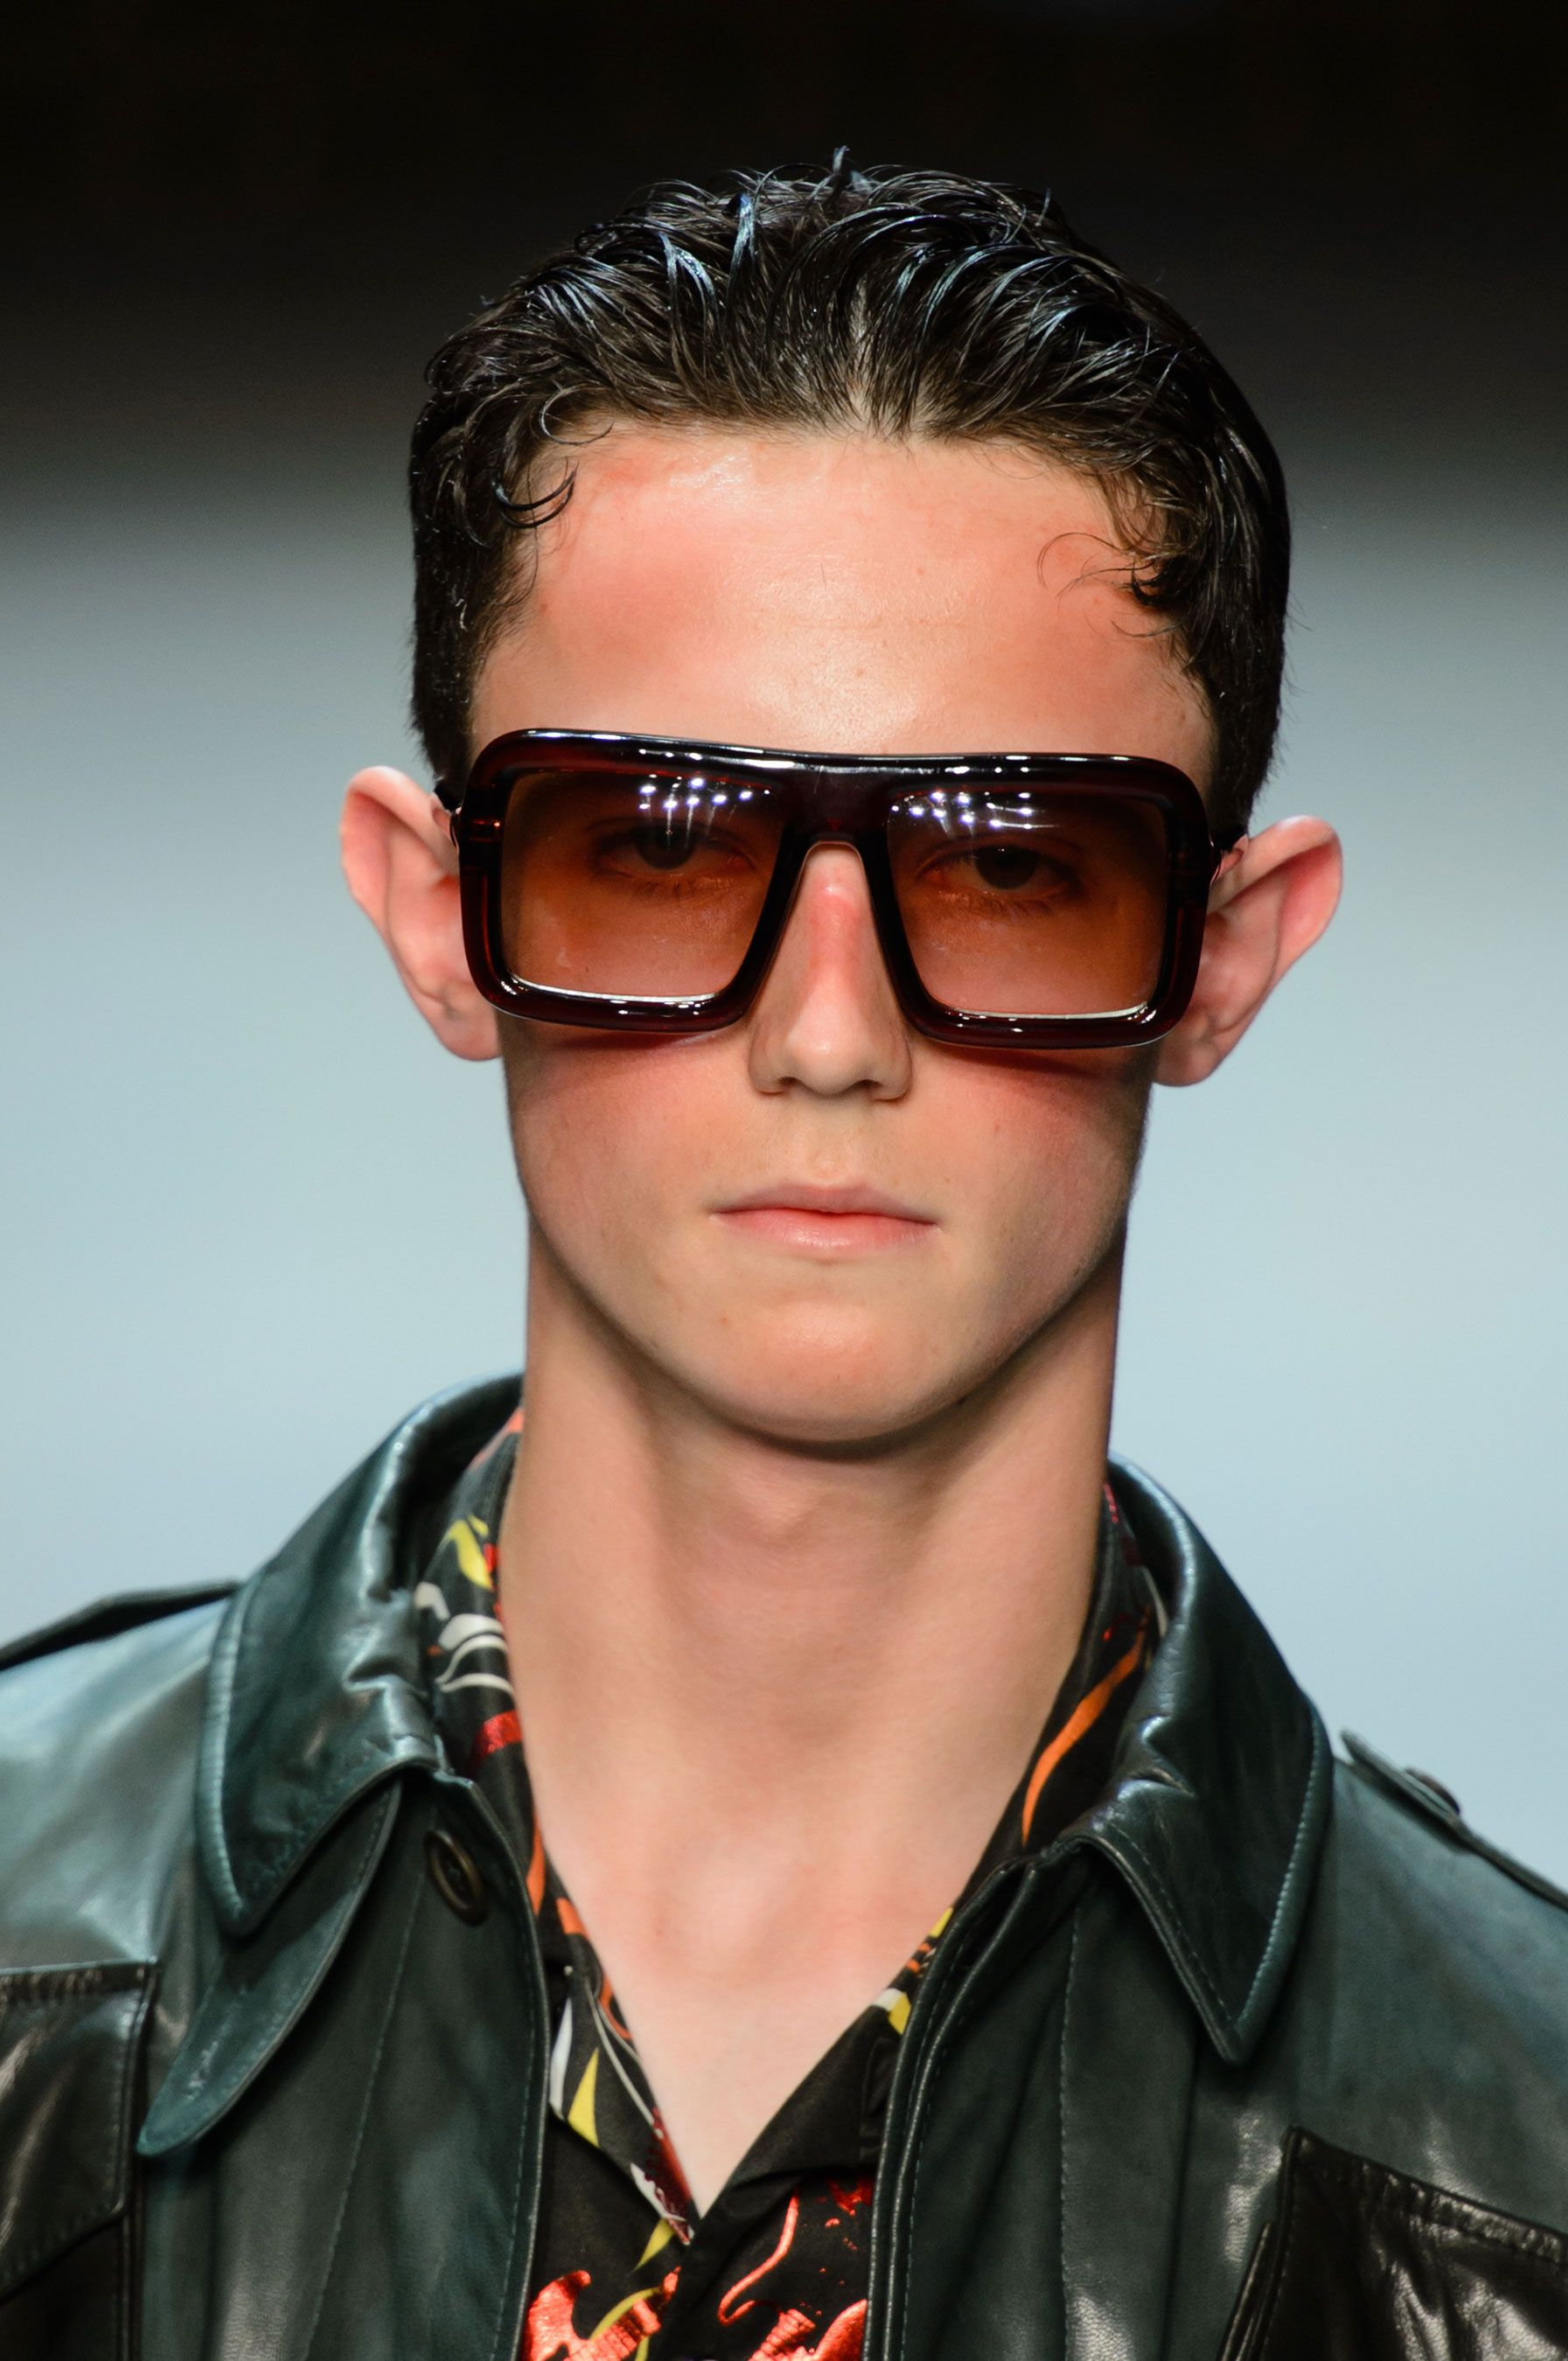 Top Man Spring 2017 #Sunglasses | Topman, Eyewear womens ...